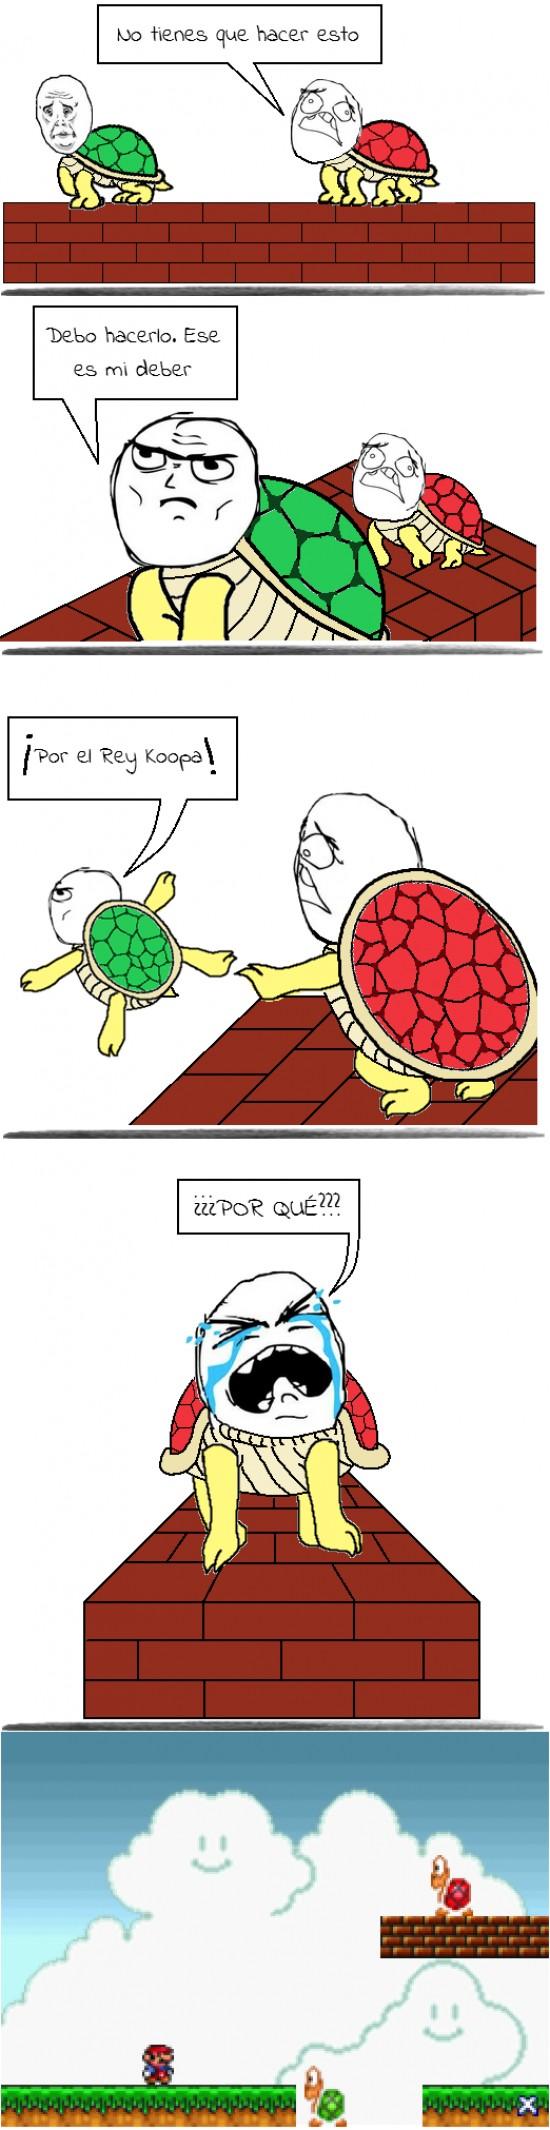 Sacrificio Nivel Mario Bros Goodbye World Goodbye My Friend Green Turtle